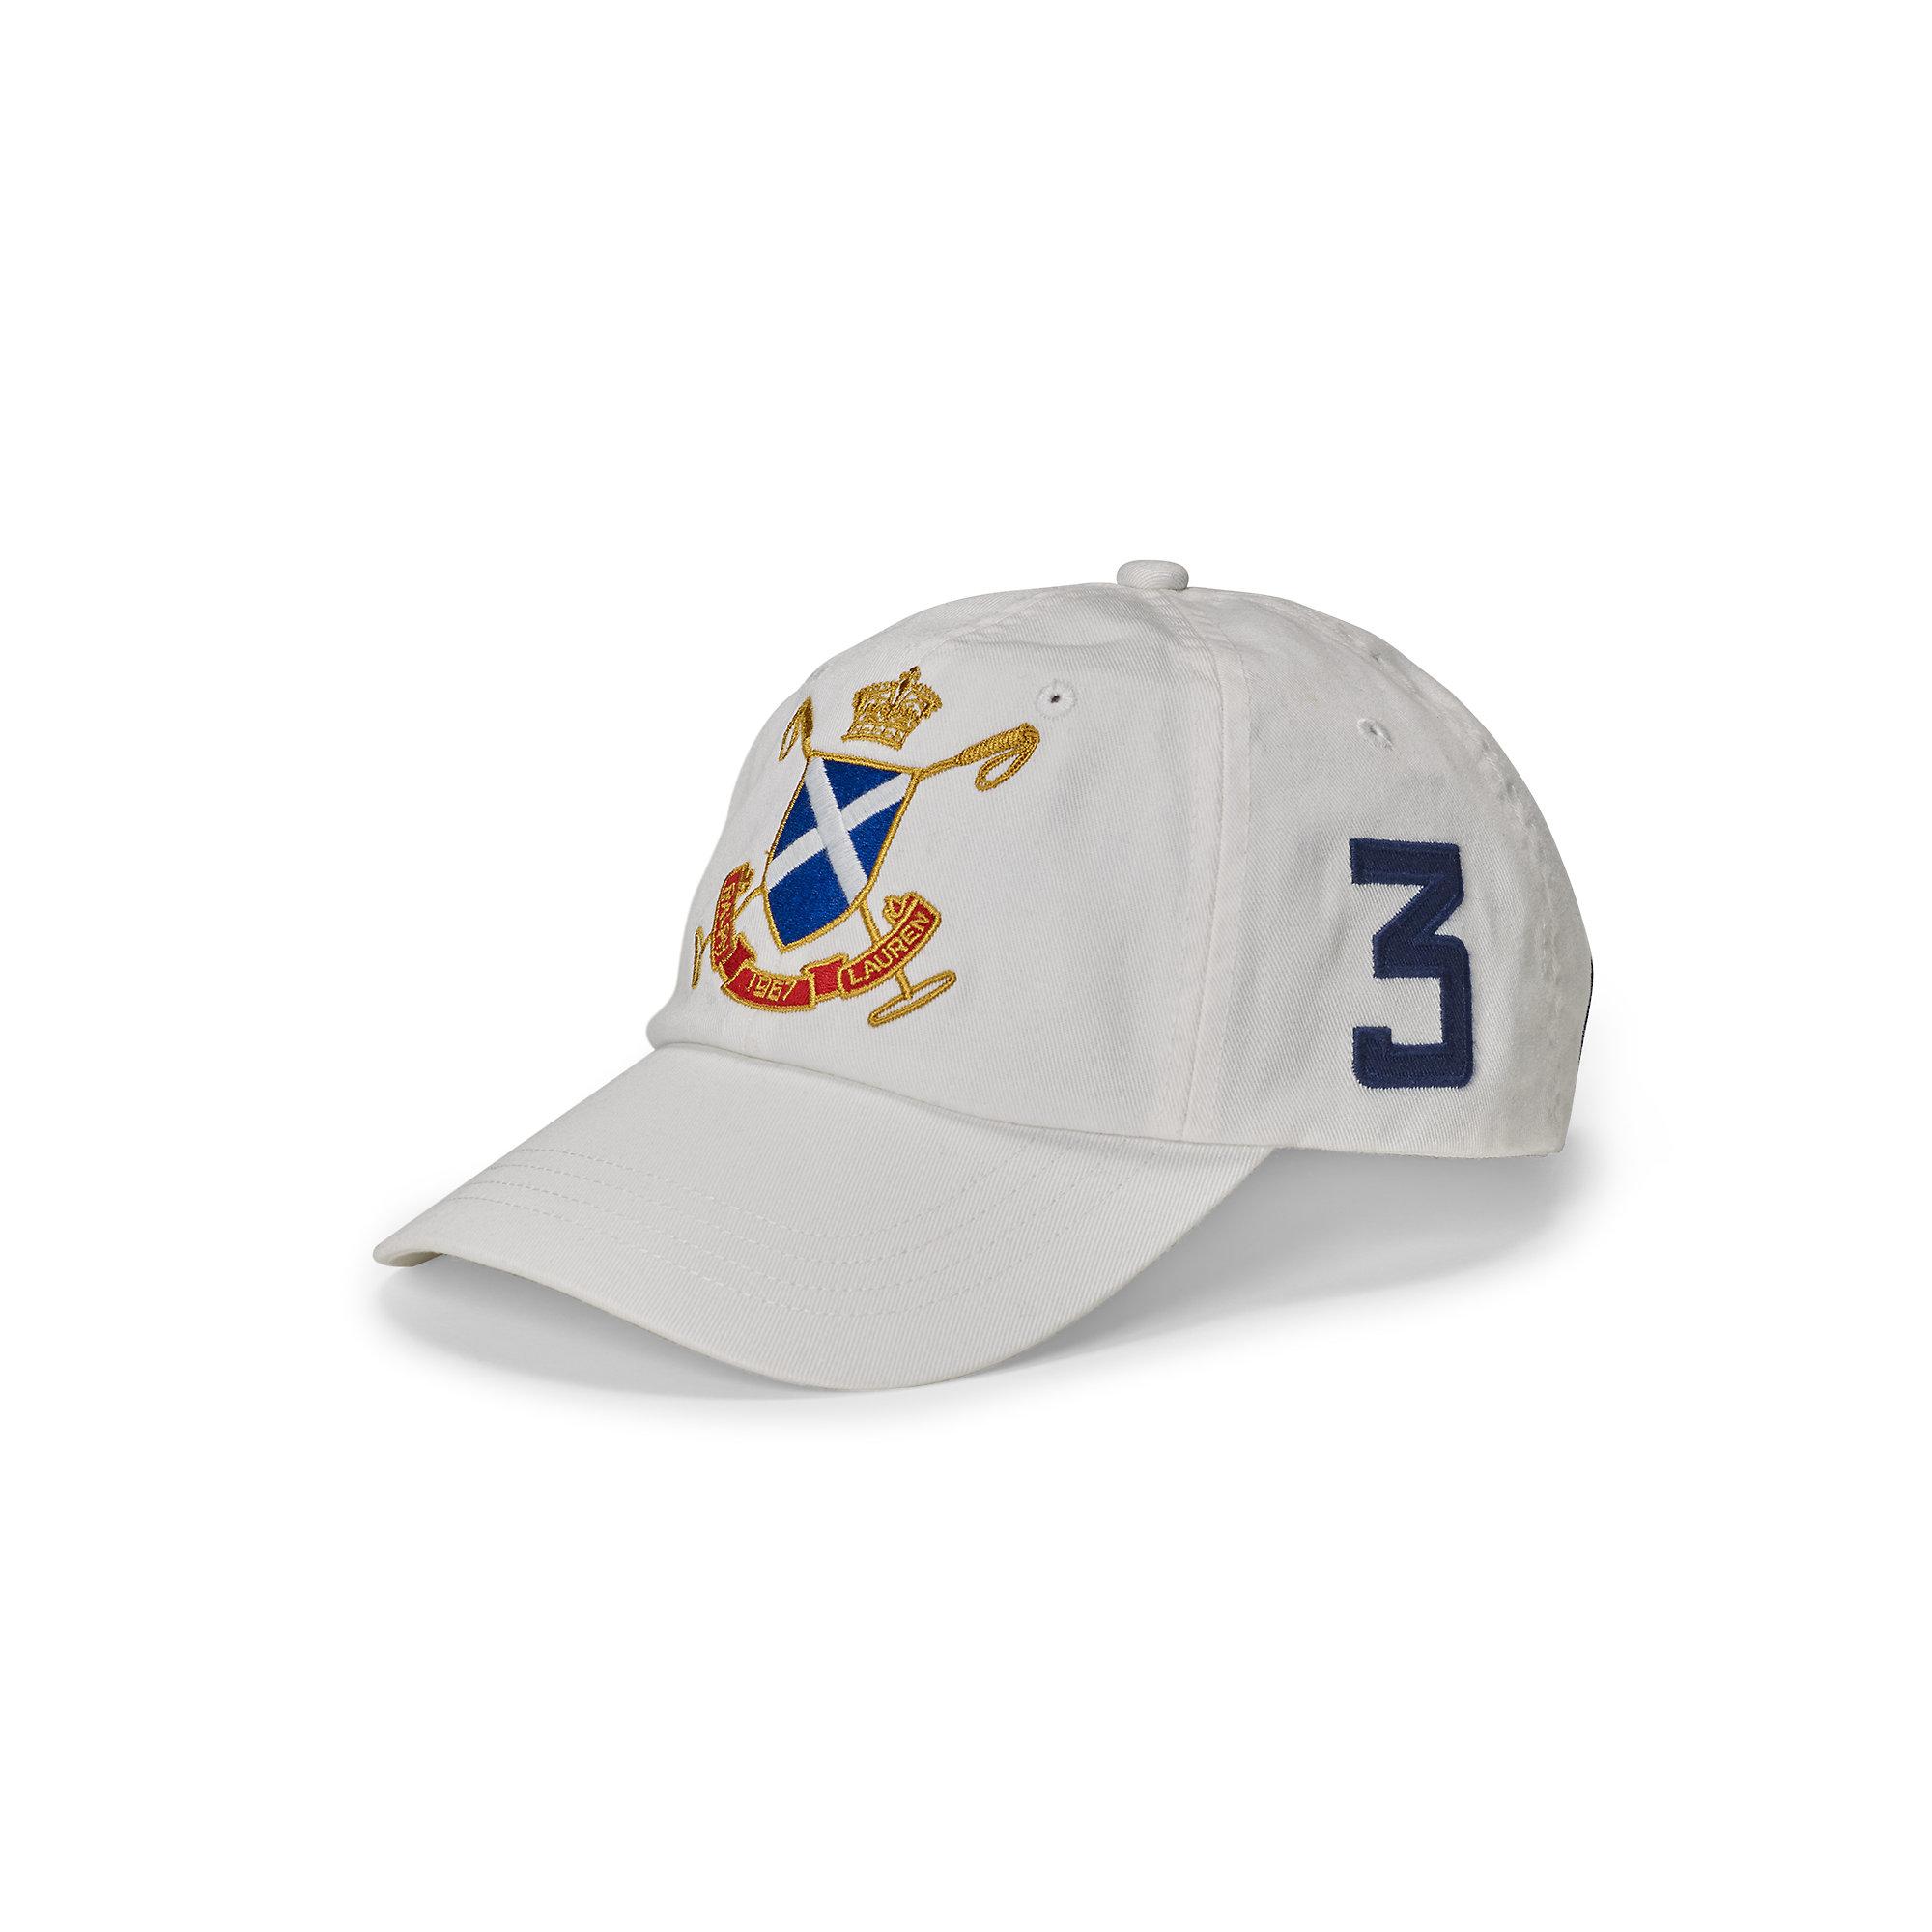 Lyst - Polo Ralph Lauren Blackwatch Cotton Baseball Cap in White for Men b6f370d857a6